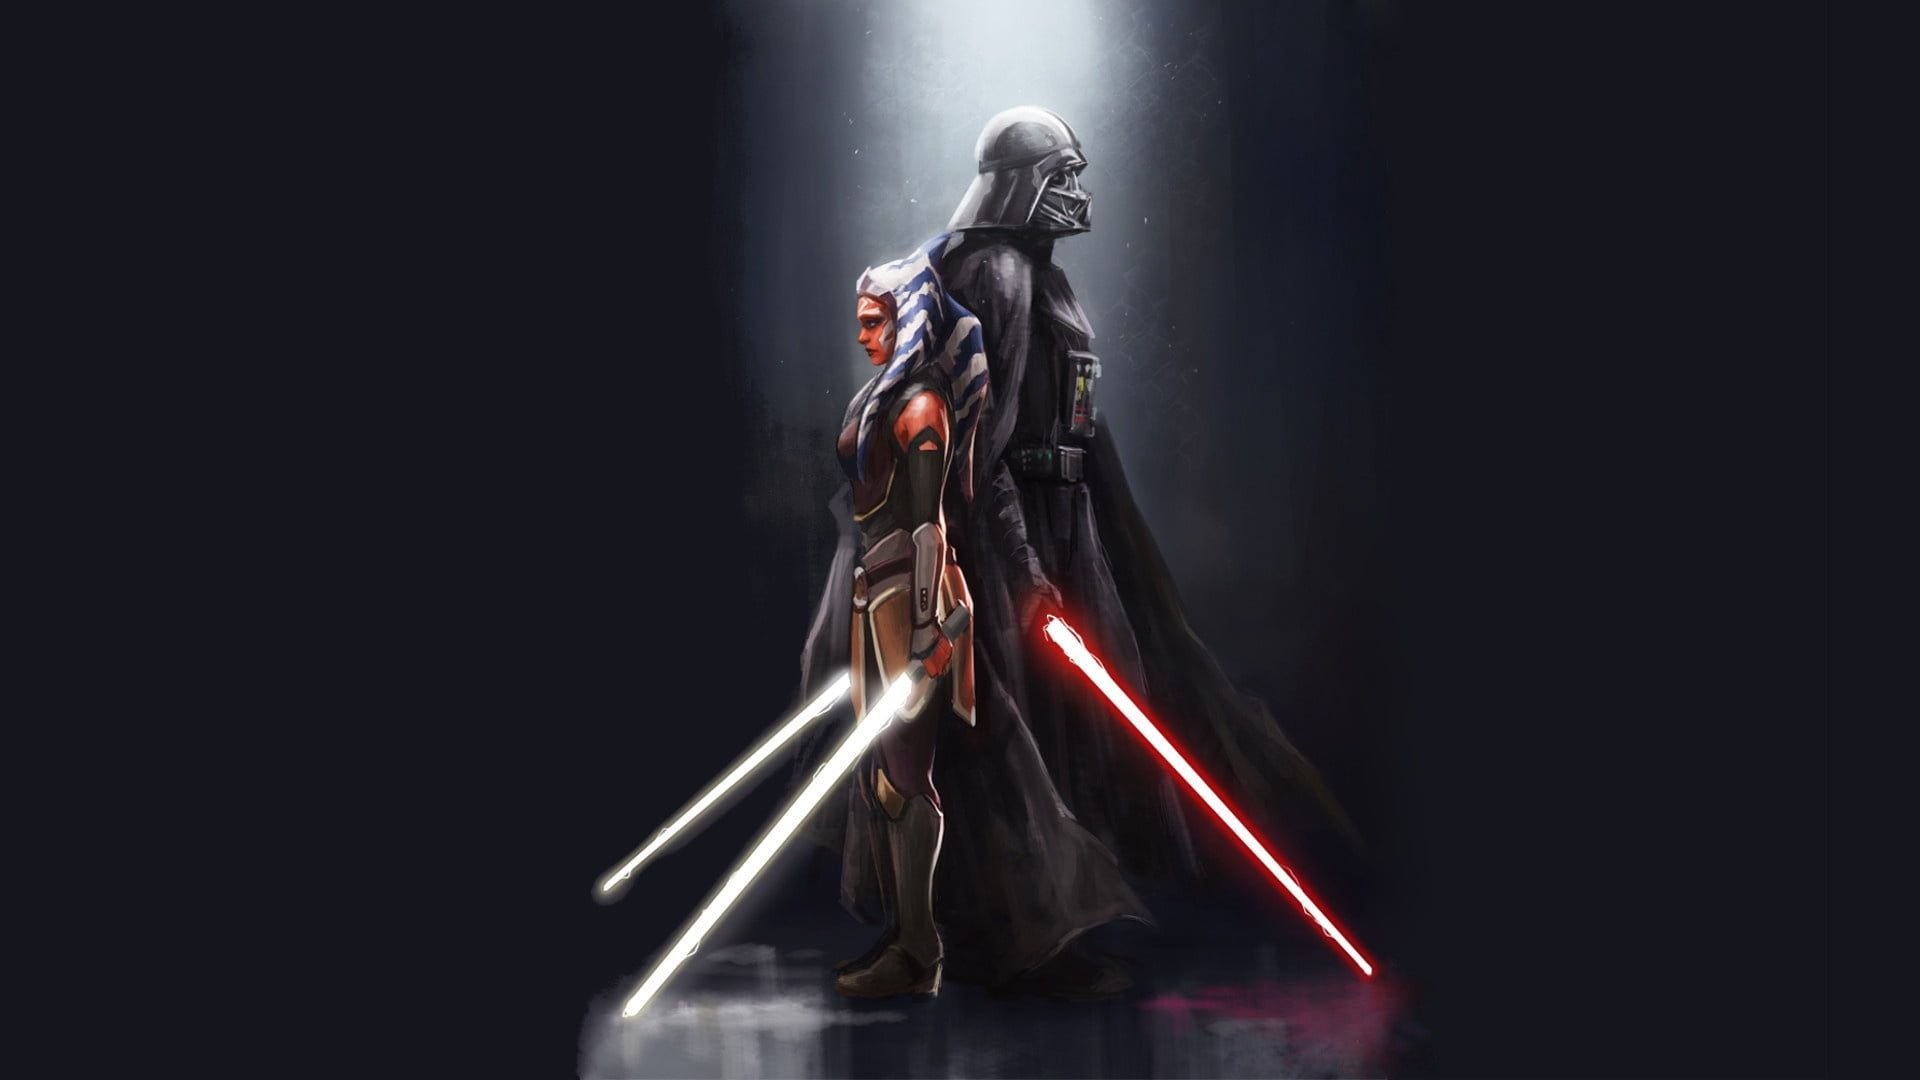 Star Wars Star Wars Rebels Ahsoka Tano Darth Vader 1080p Wallpaper Hdwallpaper Desktop Star Wars Ahsoka Darth Vader Wallpaper Star Wars Wallpaper Hd 1080p epic star wars wallpaper